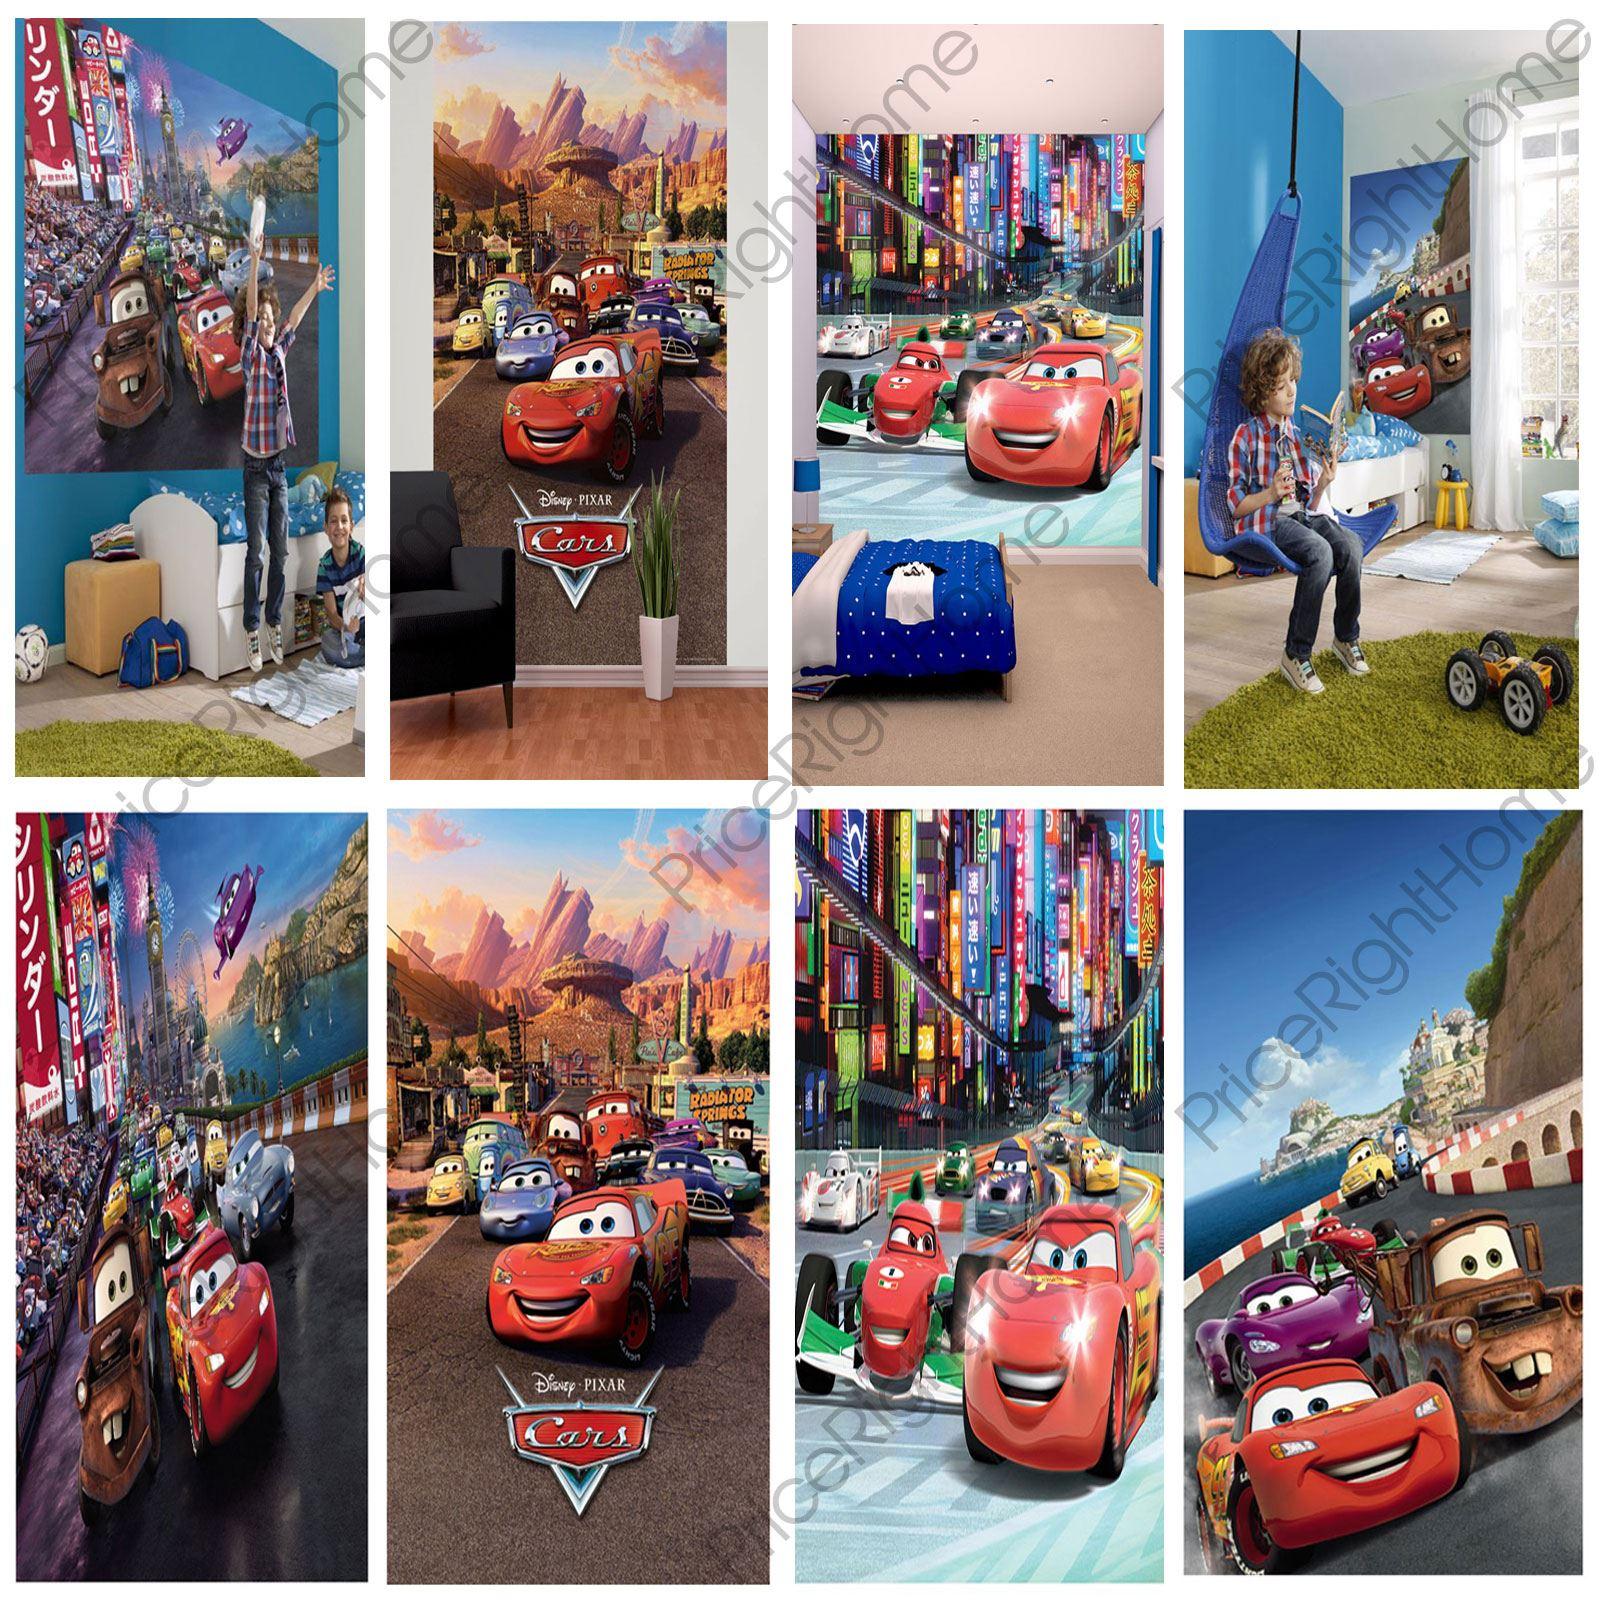 Disney Cars Mural Wallpaper Ebay Disney Cars Wall Murals 6 Designs Available Kids Bedroom